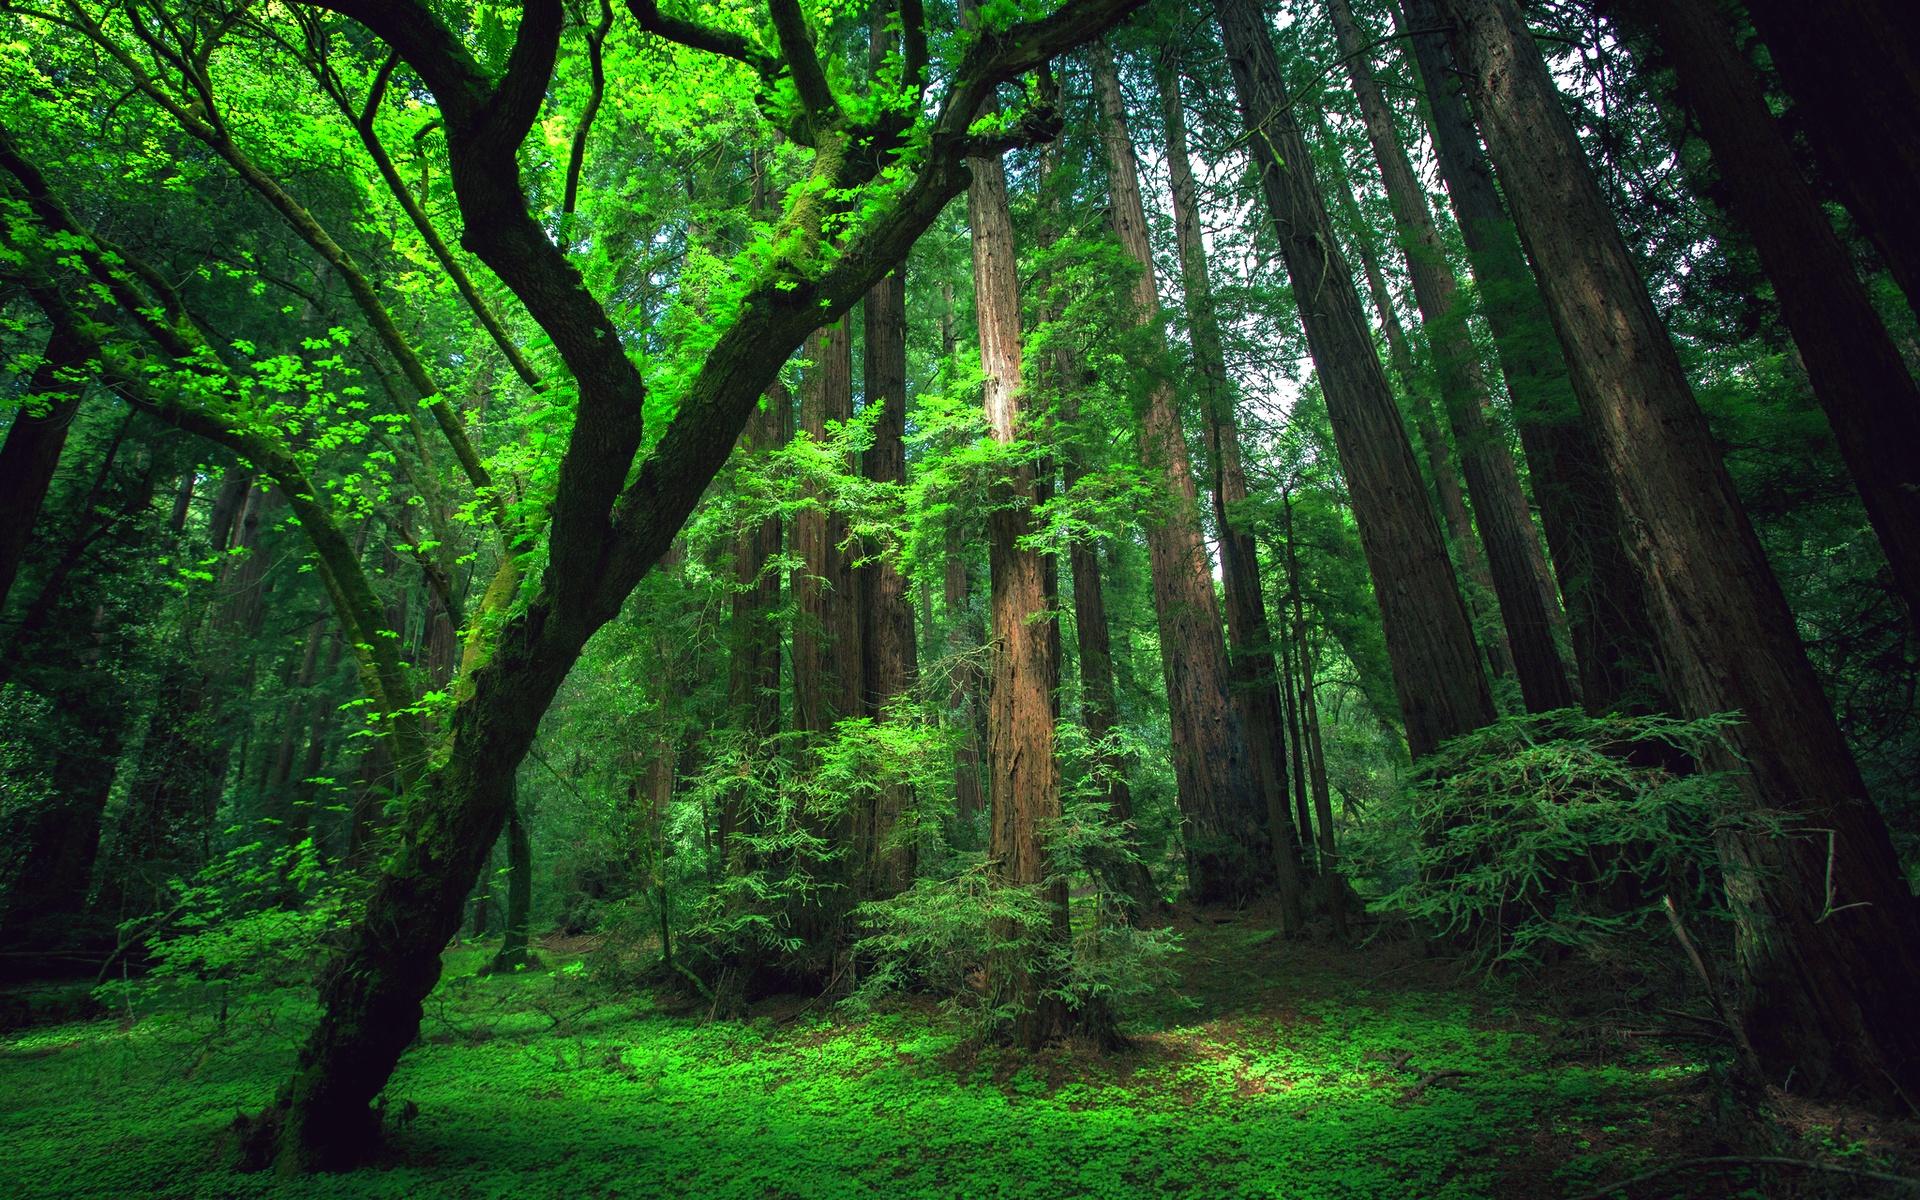 amazon nature wallpaper - photo #15